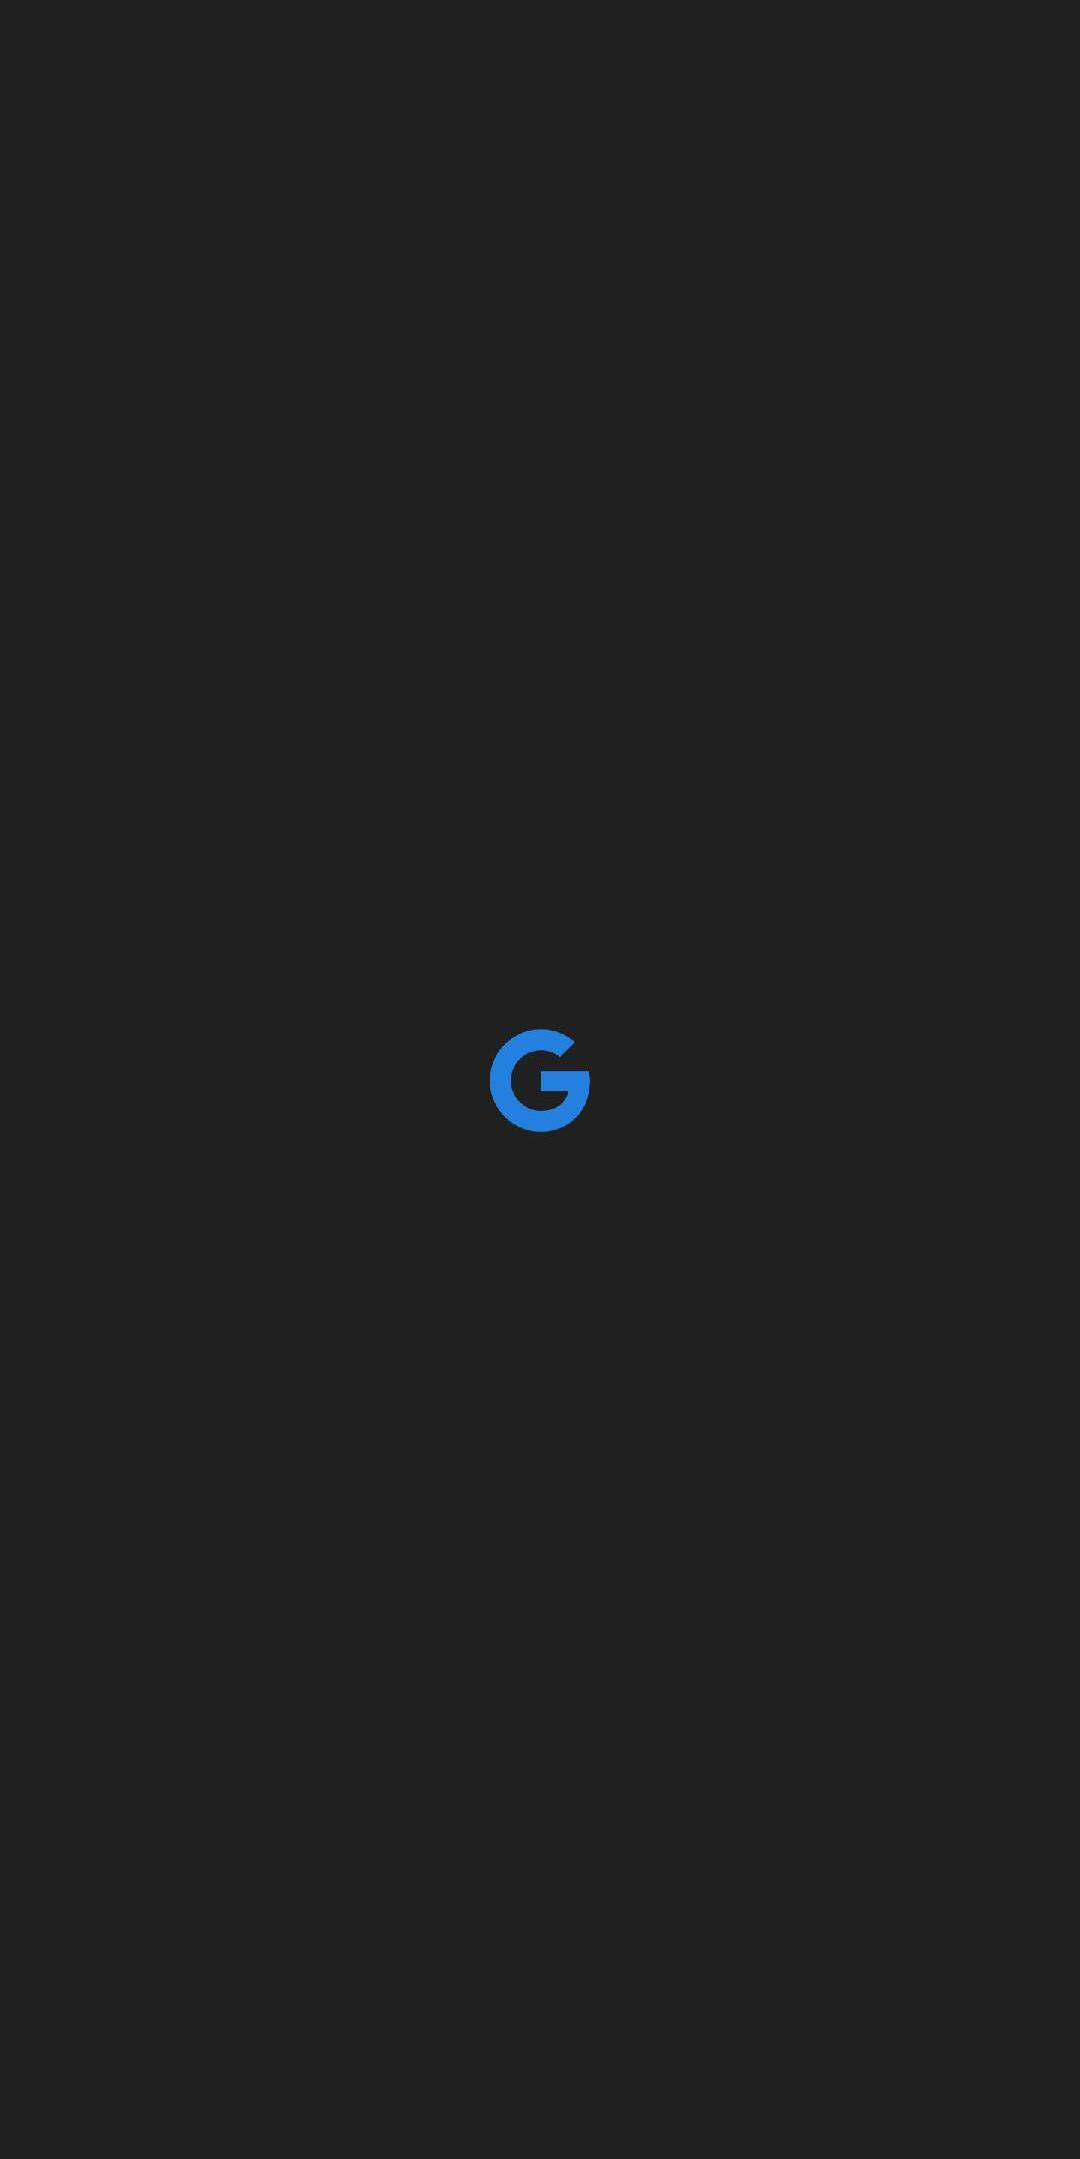 Minimal Google iPhone Wallpaper